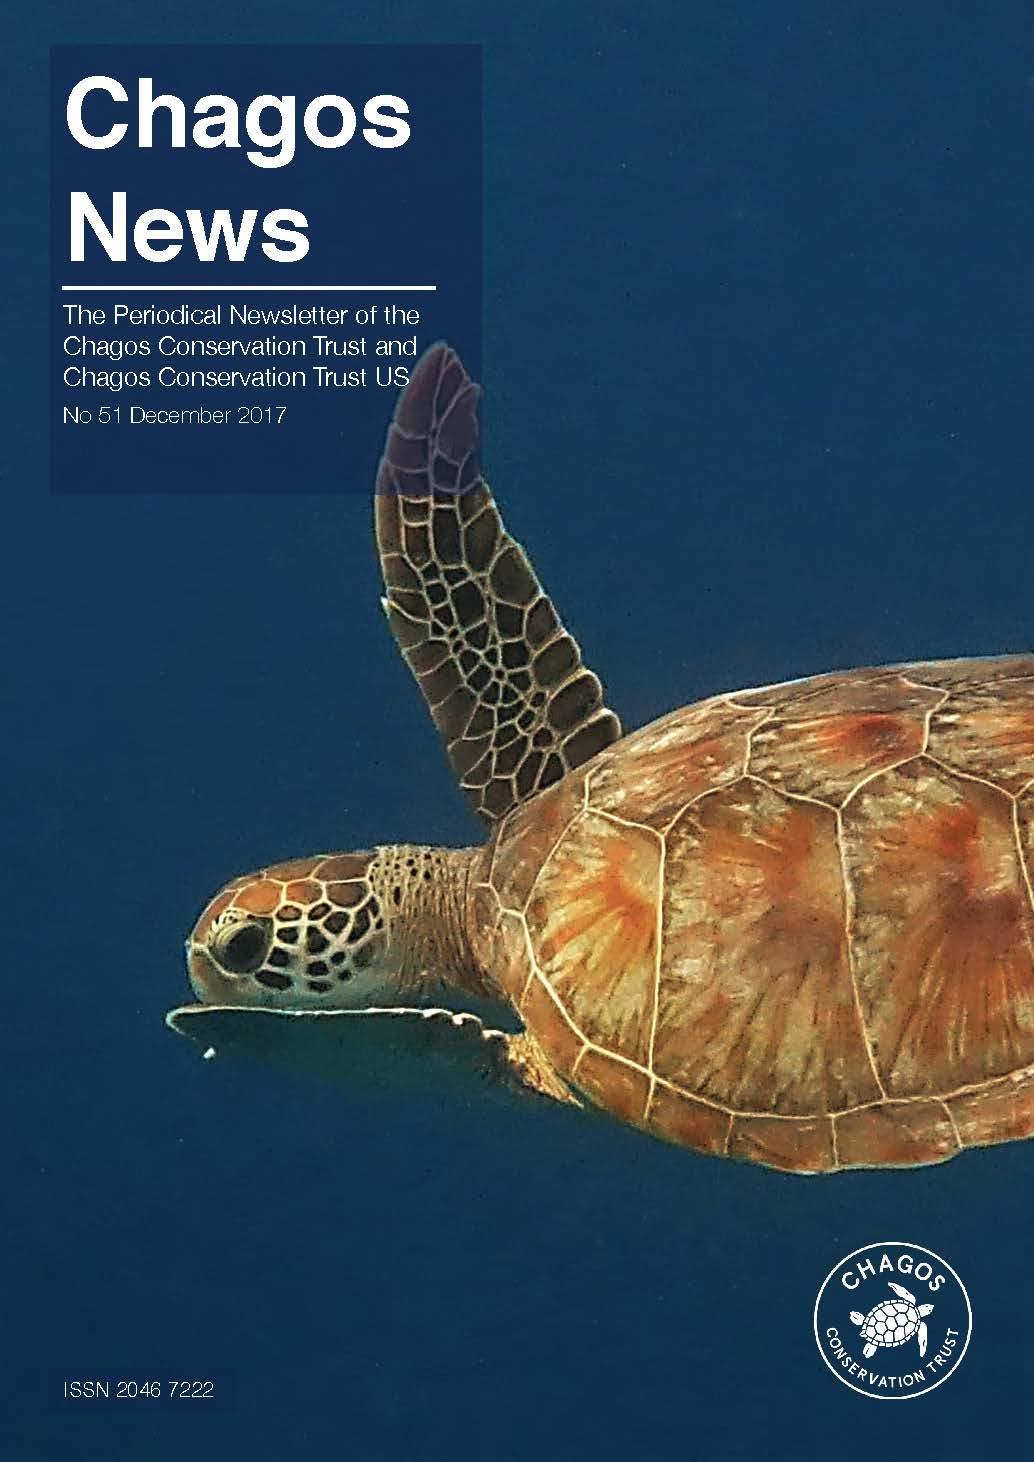 Chagos News issue #51